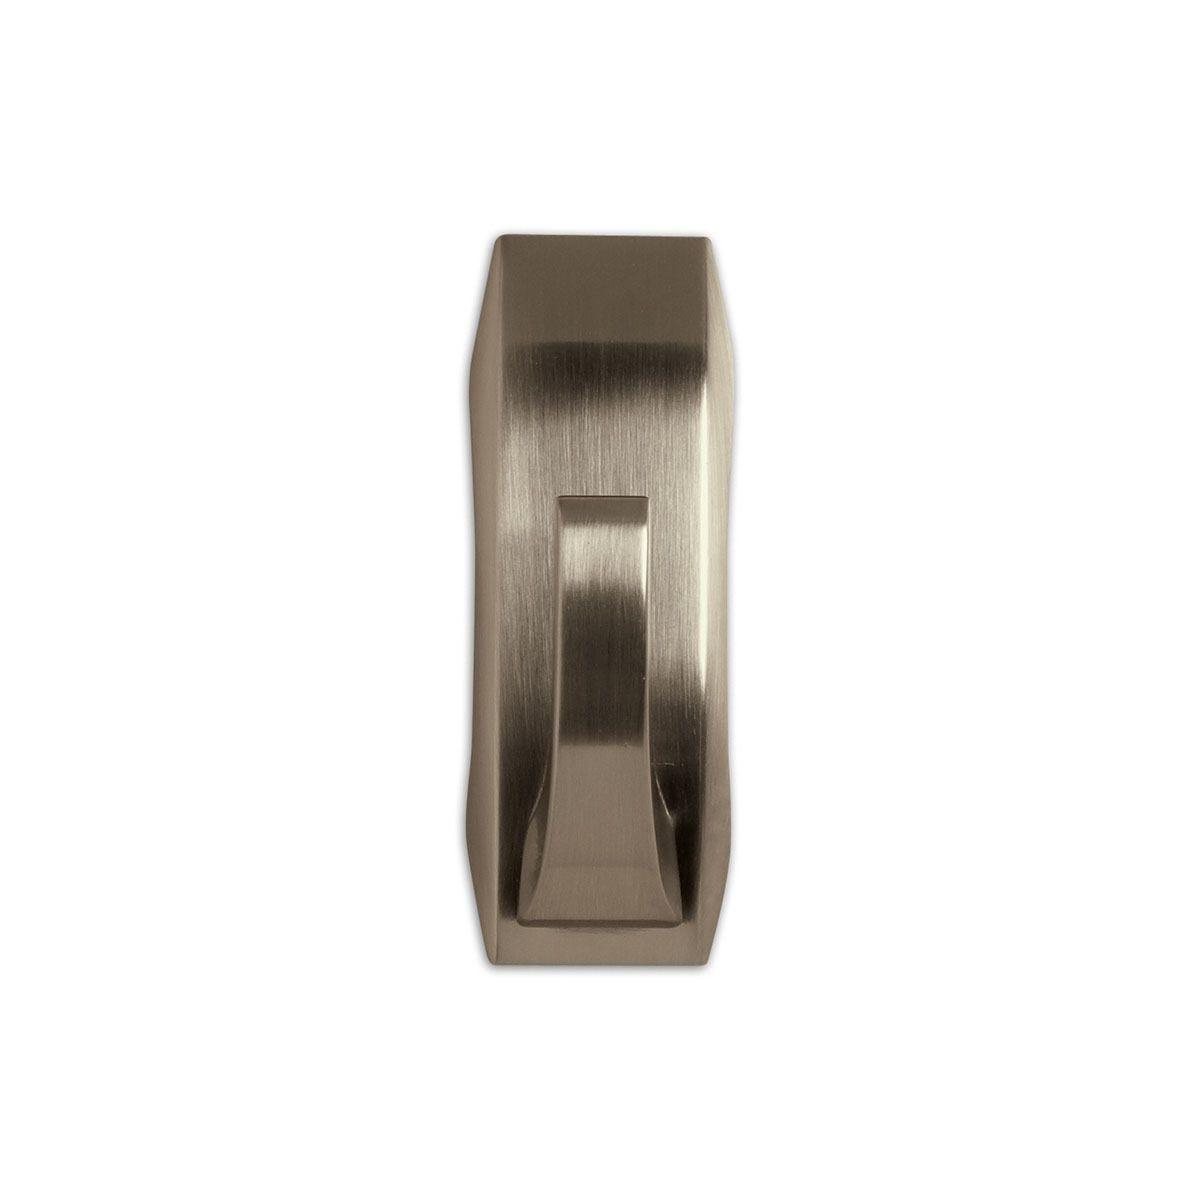 3M Command Bathroom Hook – Silver